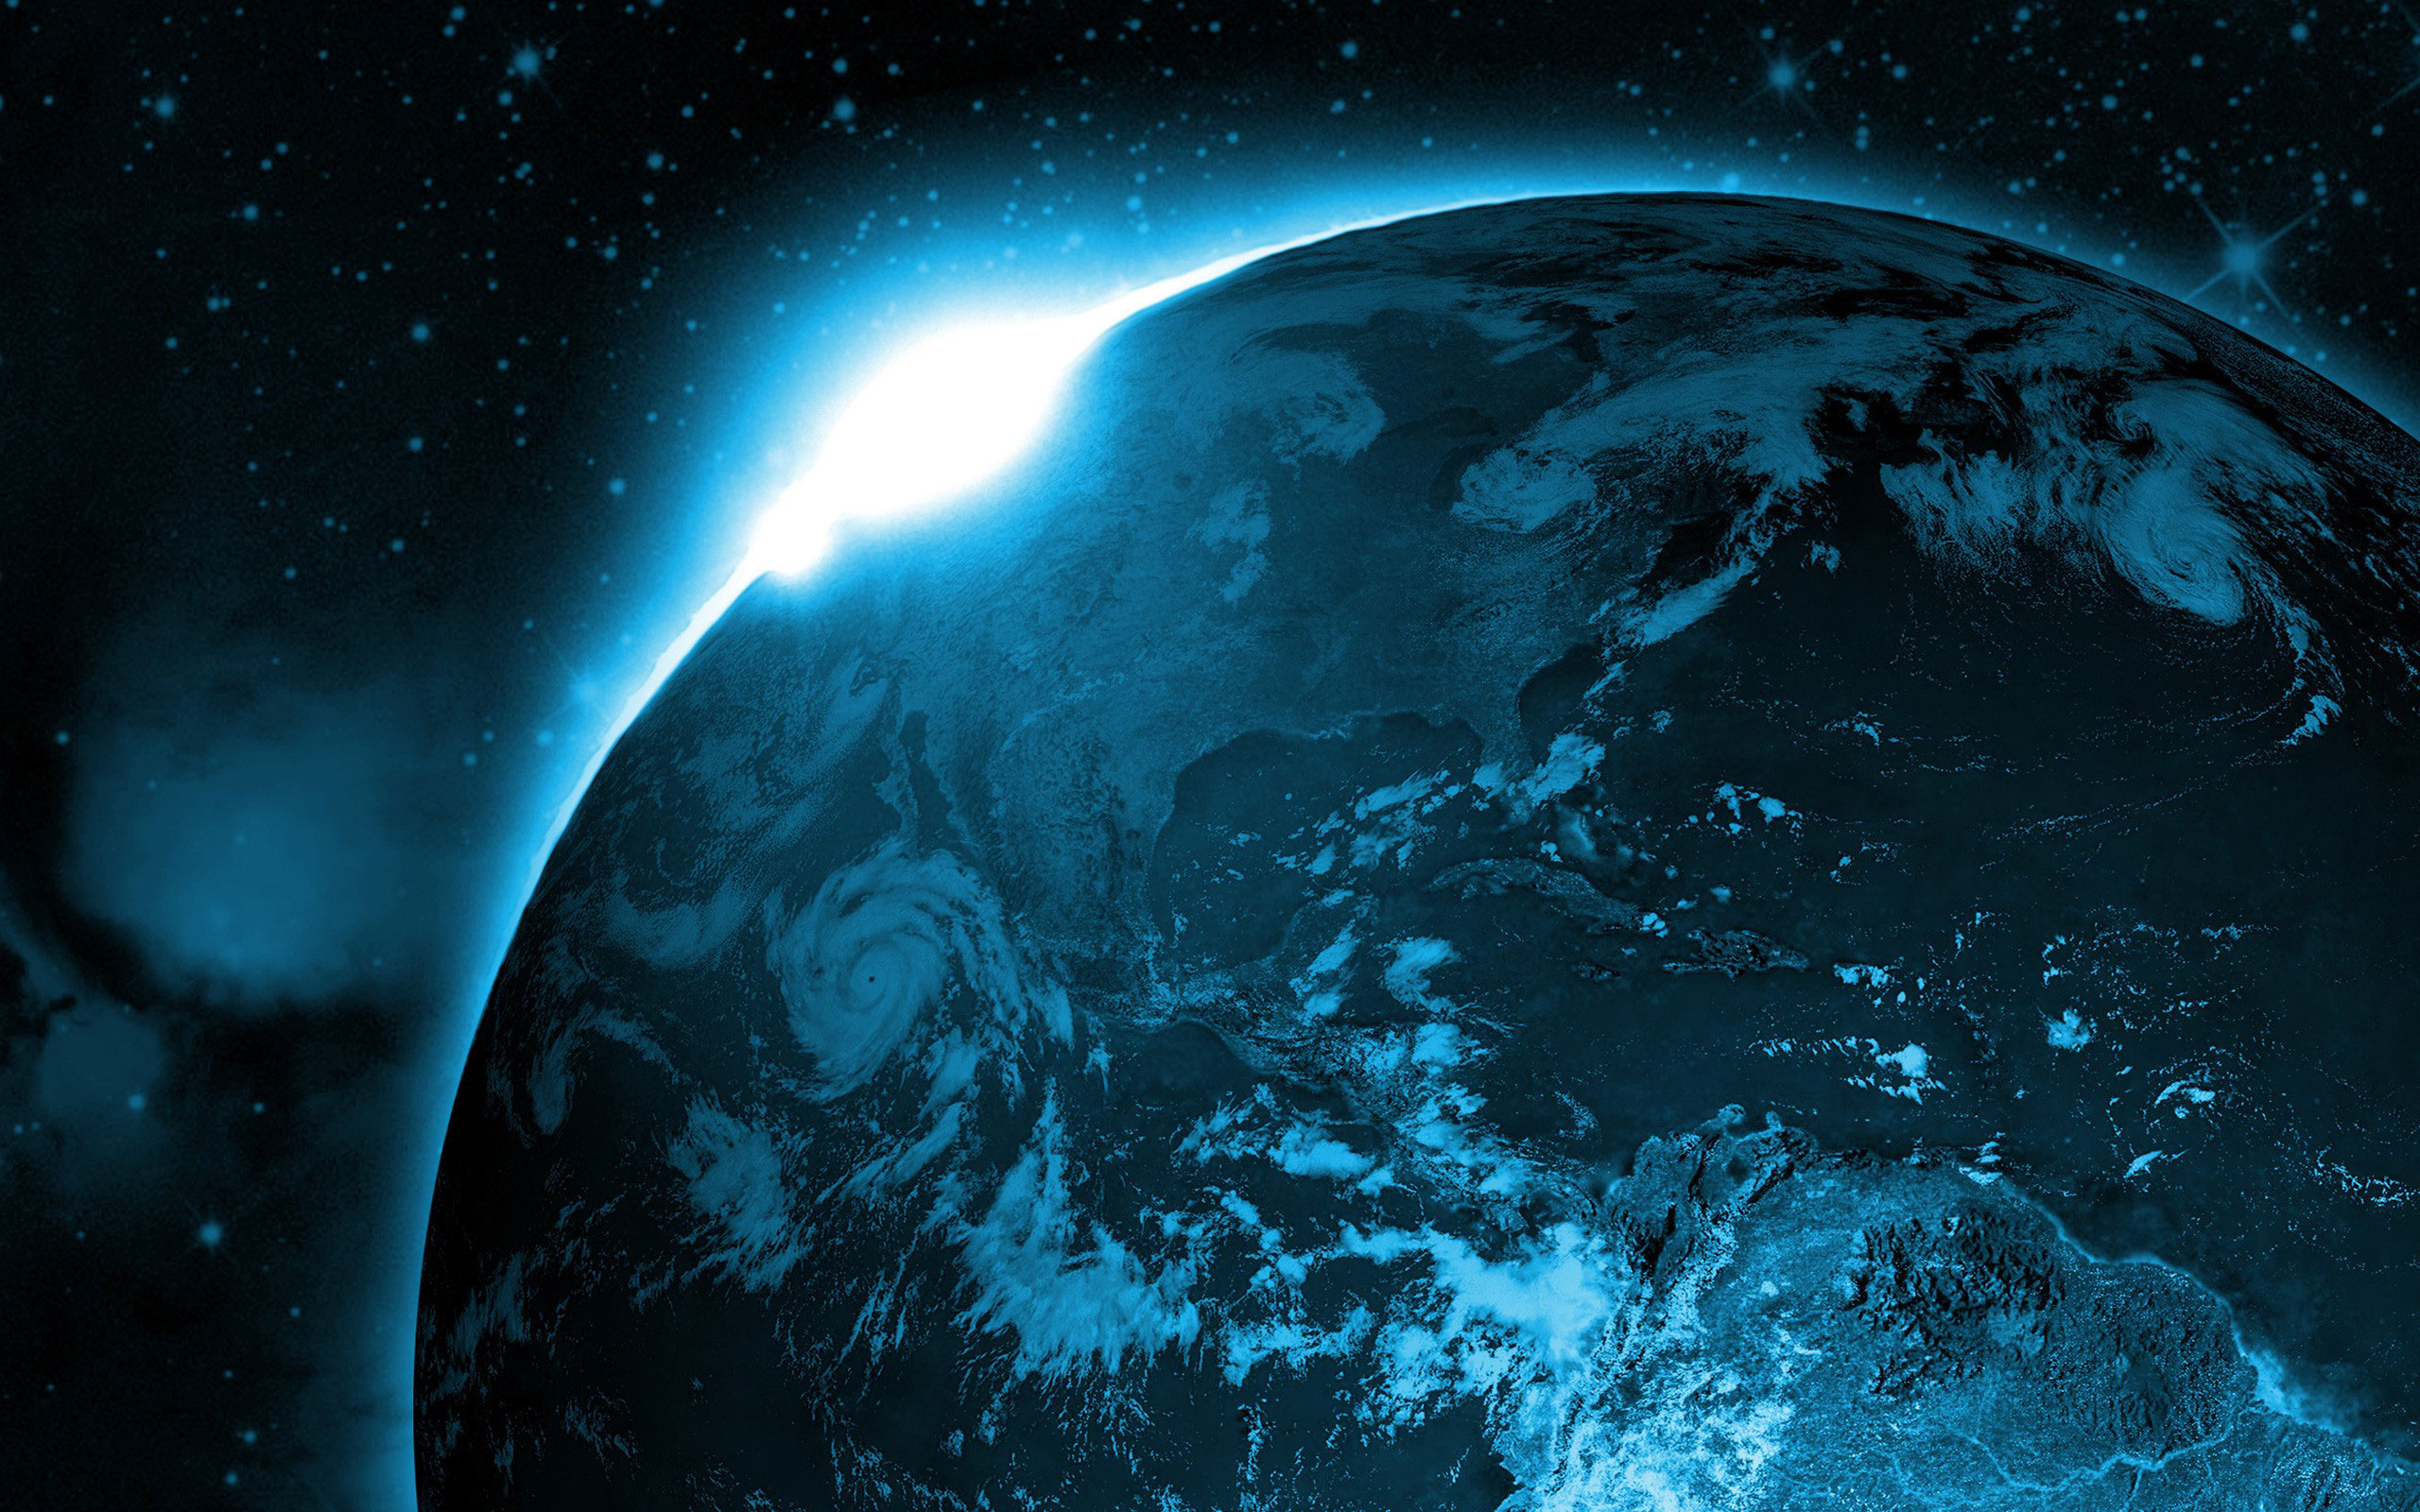 Ar condicionado pode revelar vida extraterrestre